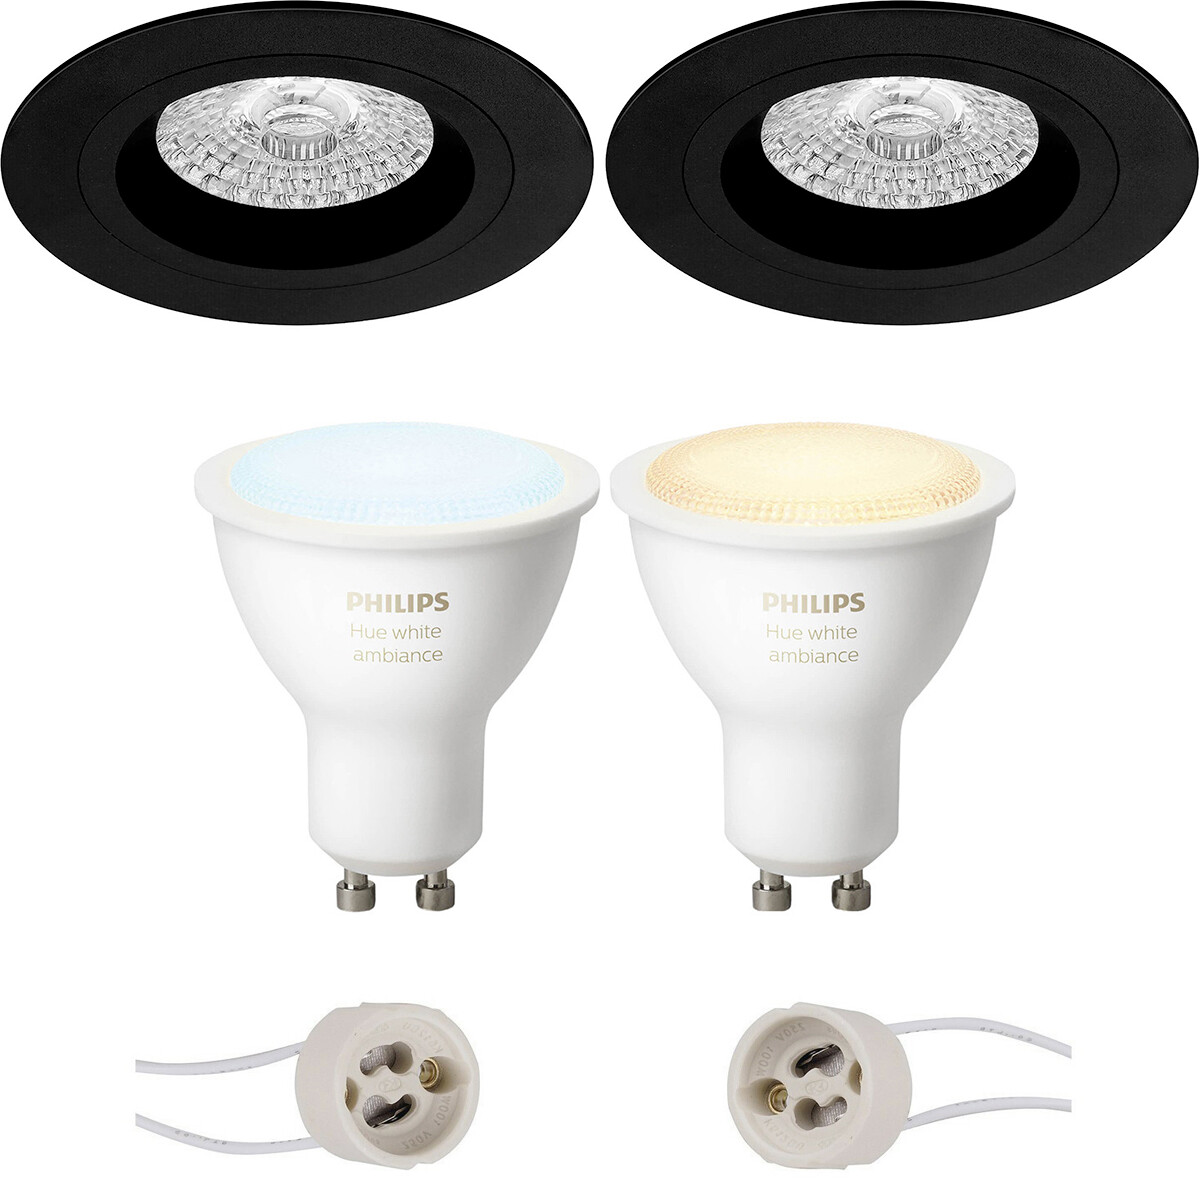 Pragmi Rodos Pro - Inbouw Rond - Mat Zwart - Ø93mm - Philips Hue - LED Spot Set GU10 - White Ambianc